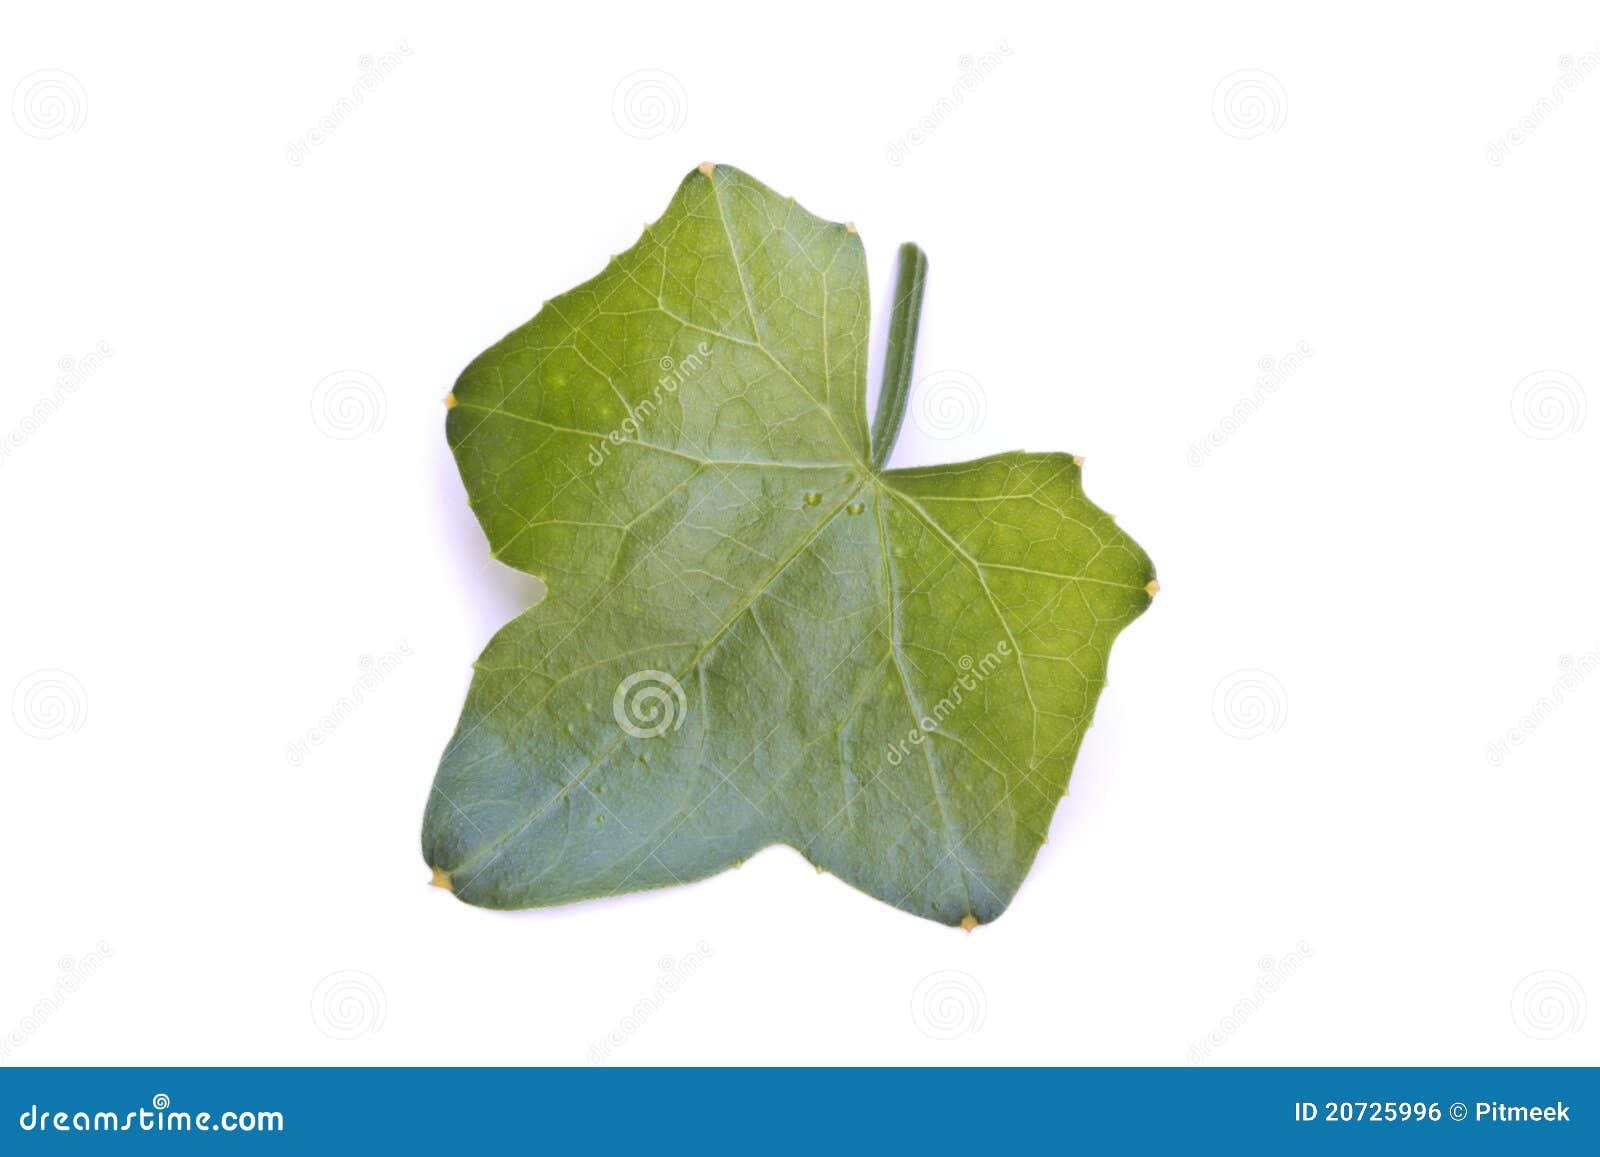 A Ivy Gourd Vegetable Leaf Royalty Free Stock Image - Image: 20725996